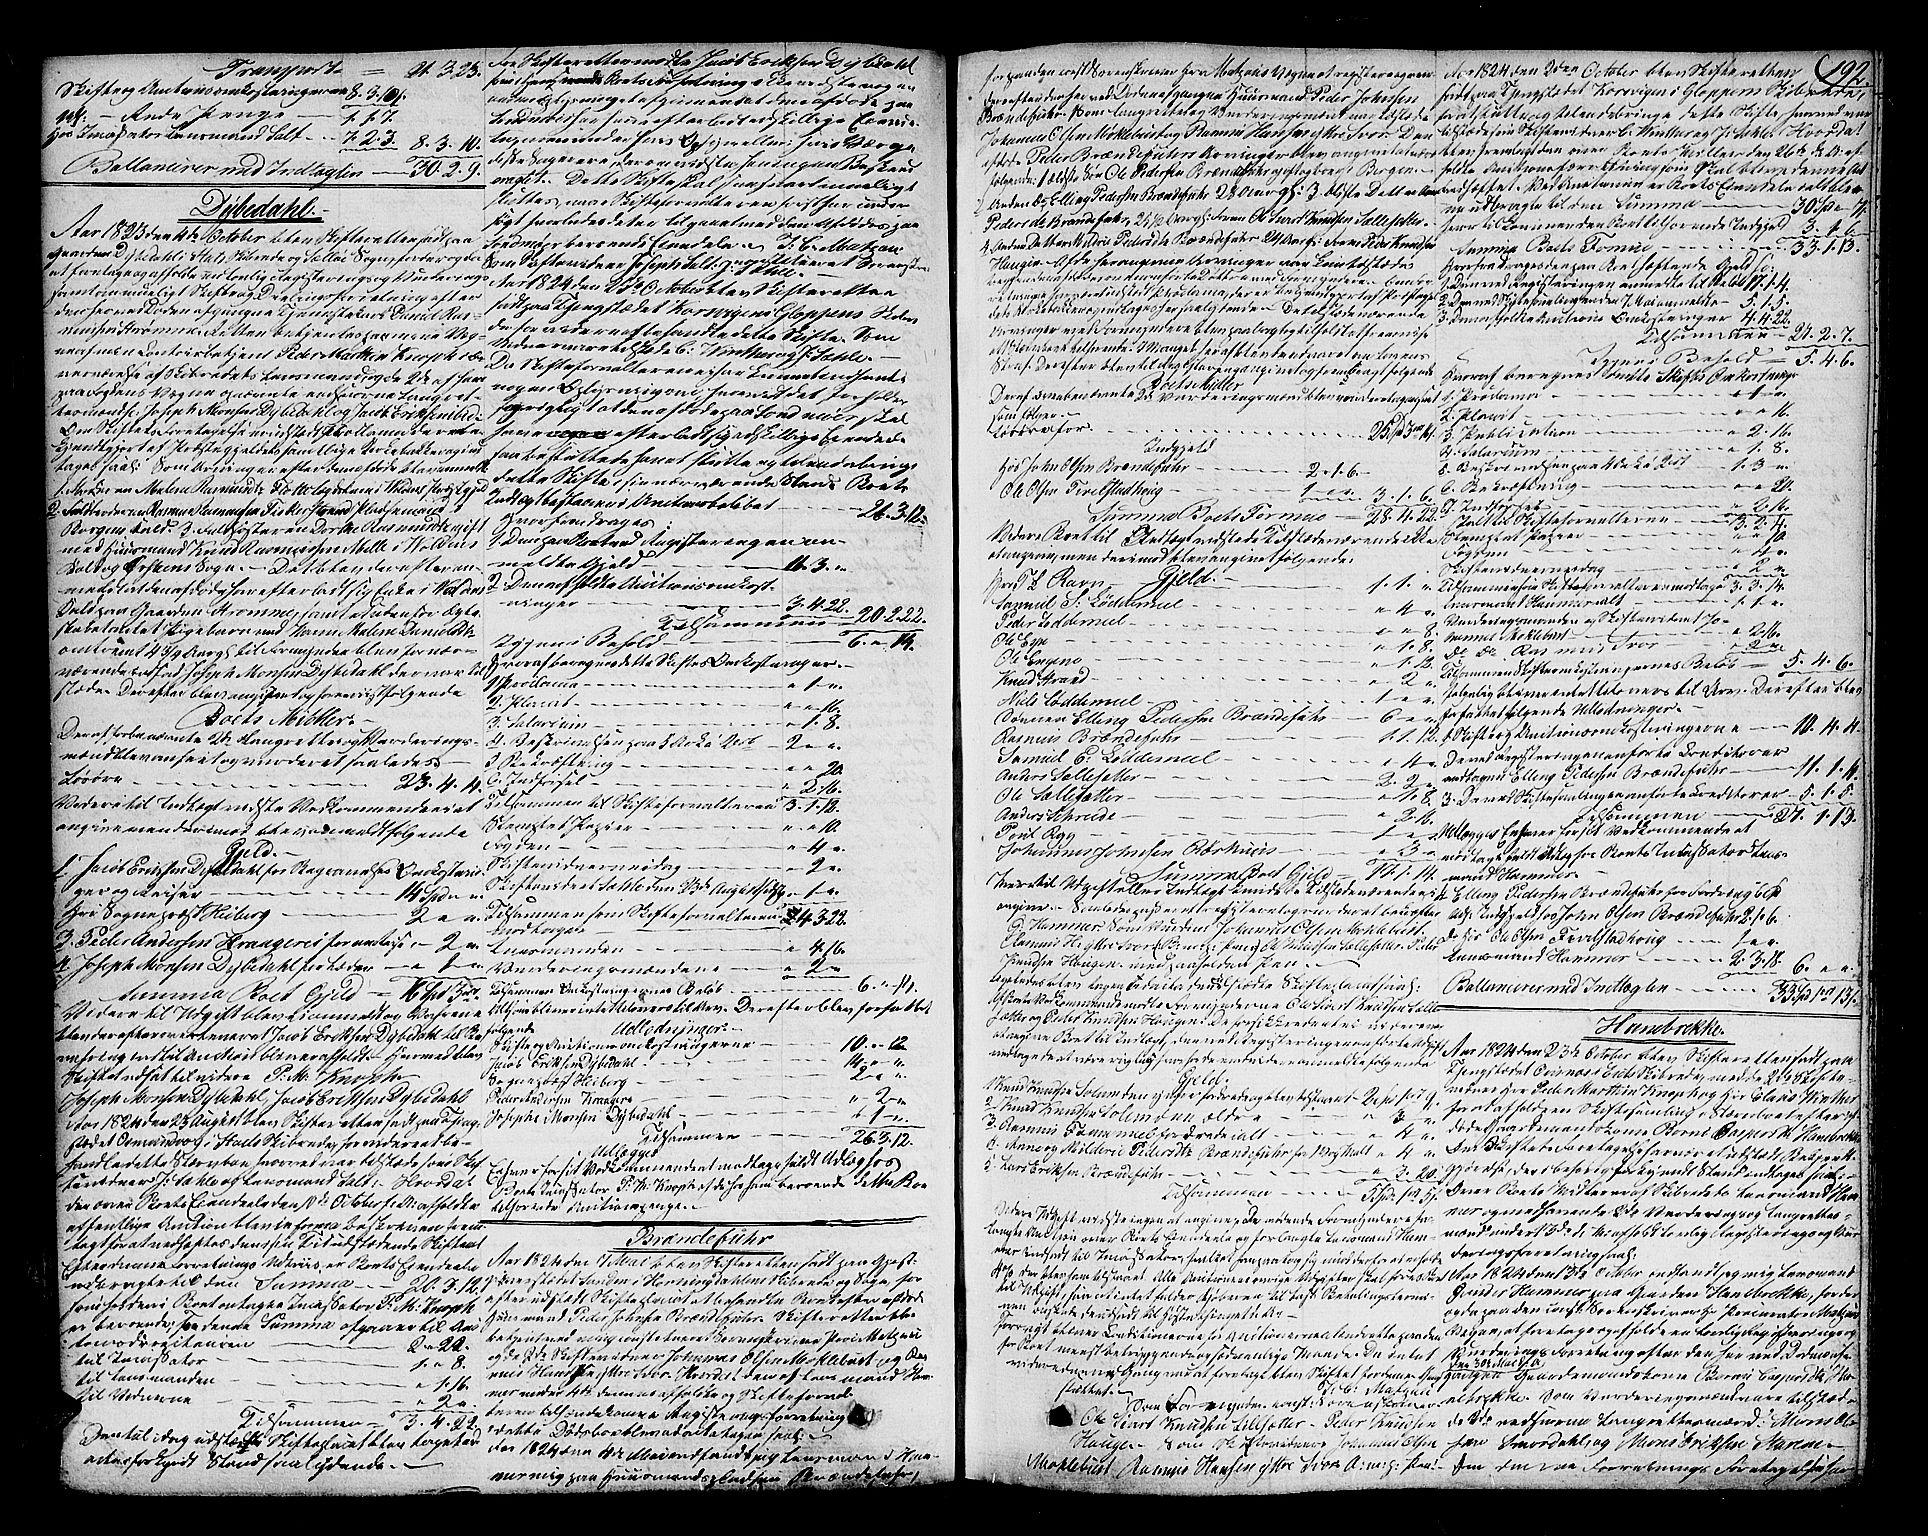 SAB, Nordfjord Sorenskriveri, 04/04a/L0023a: Skifteprotokollar, 1822-1833, s. 191b-192a